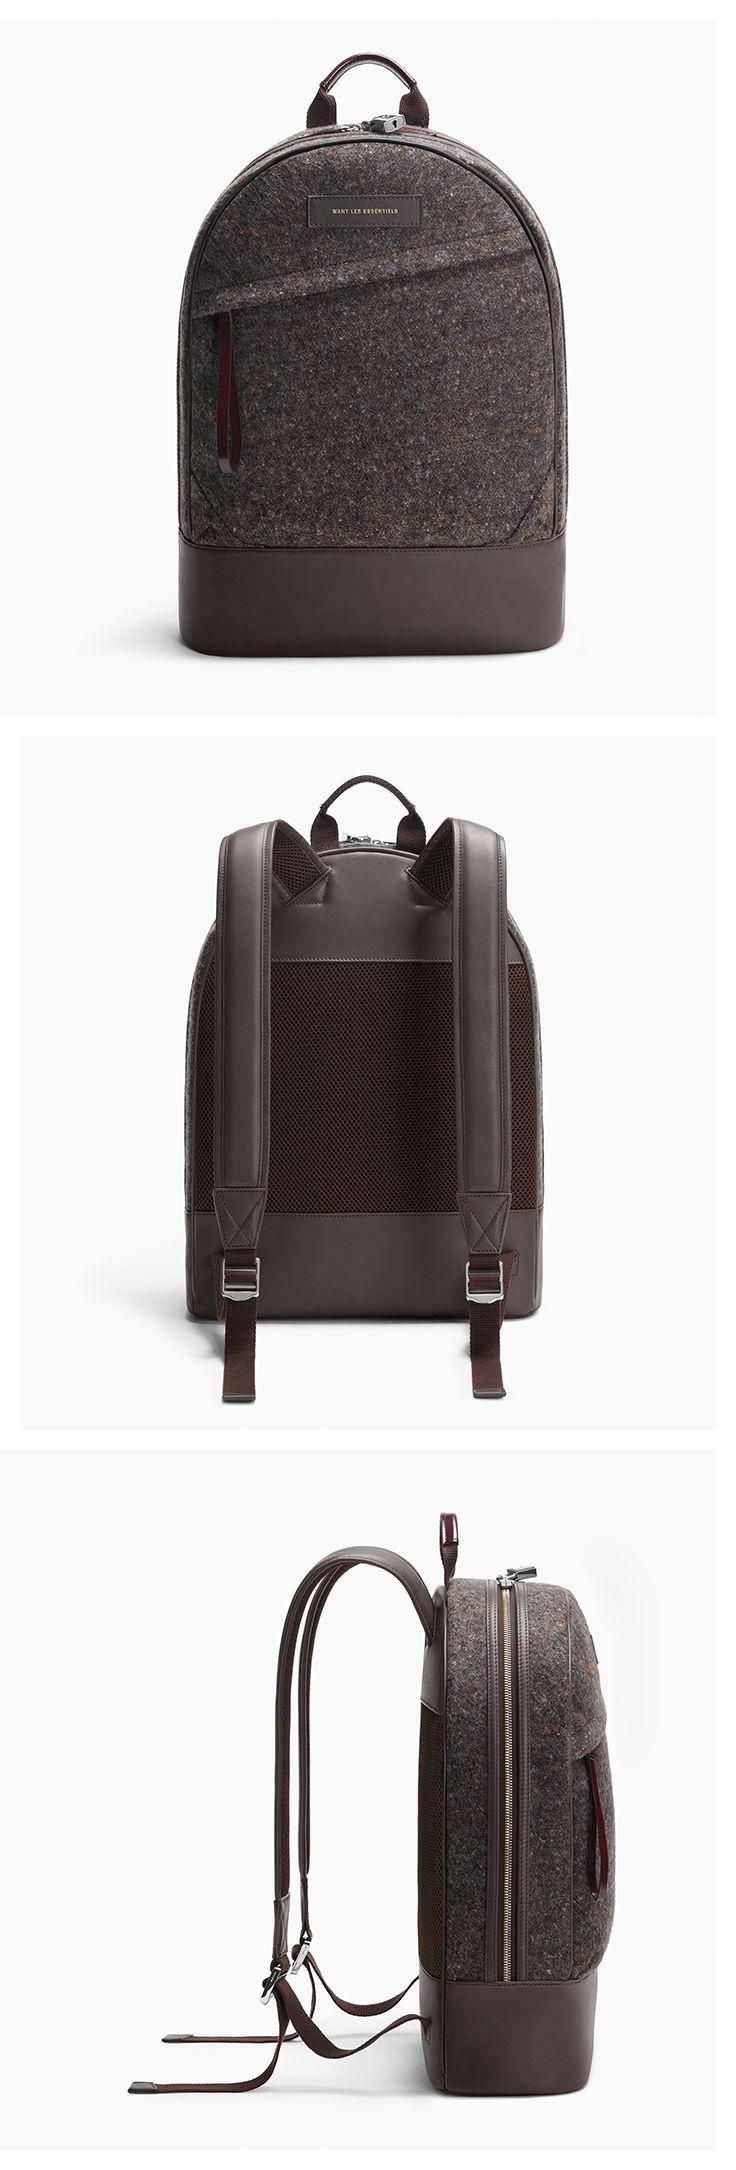 A/W 16 Kastrup backpack in Multi Blanket Drill